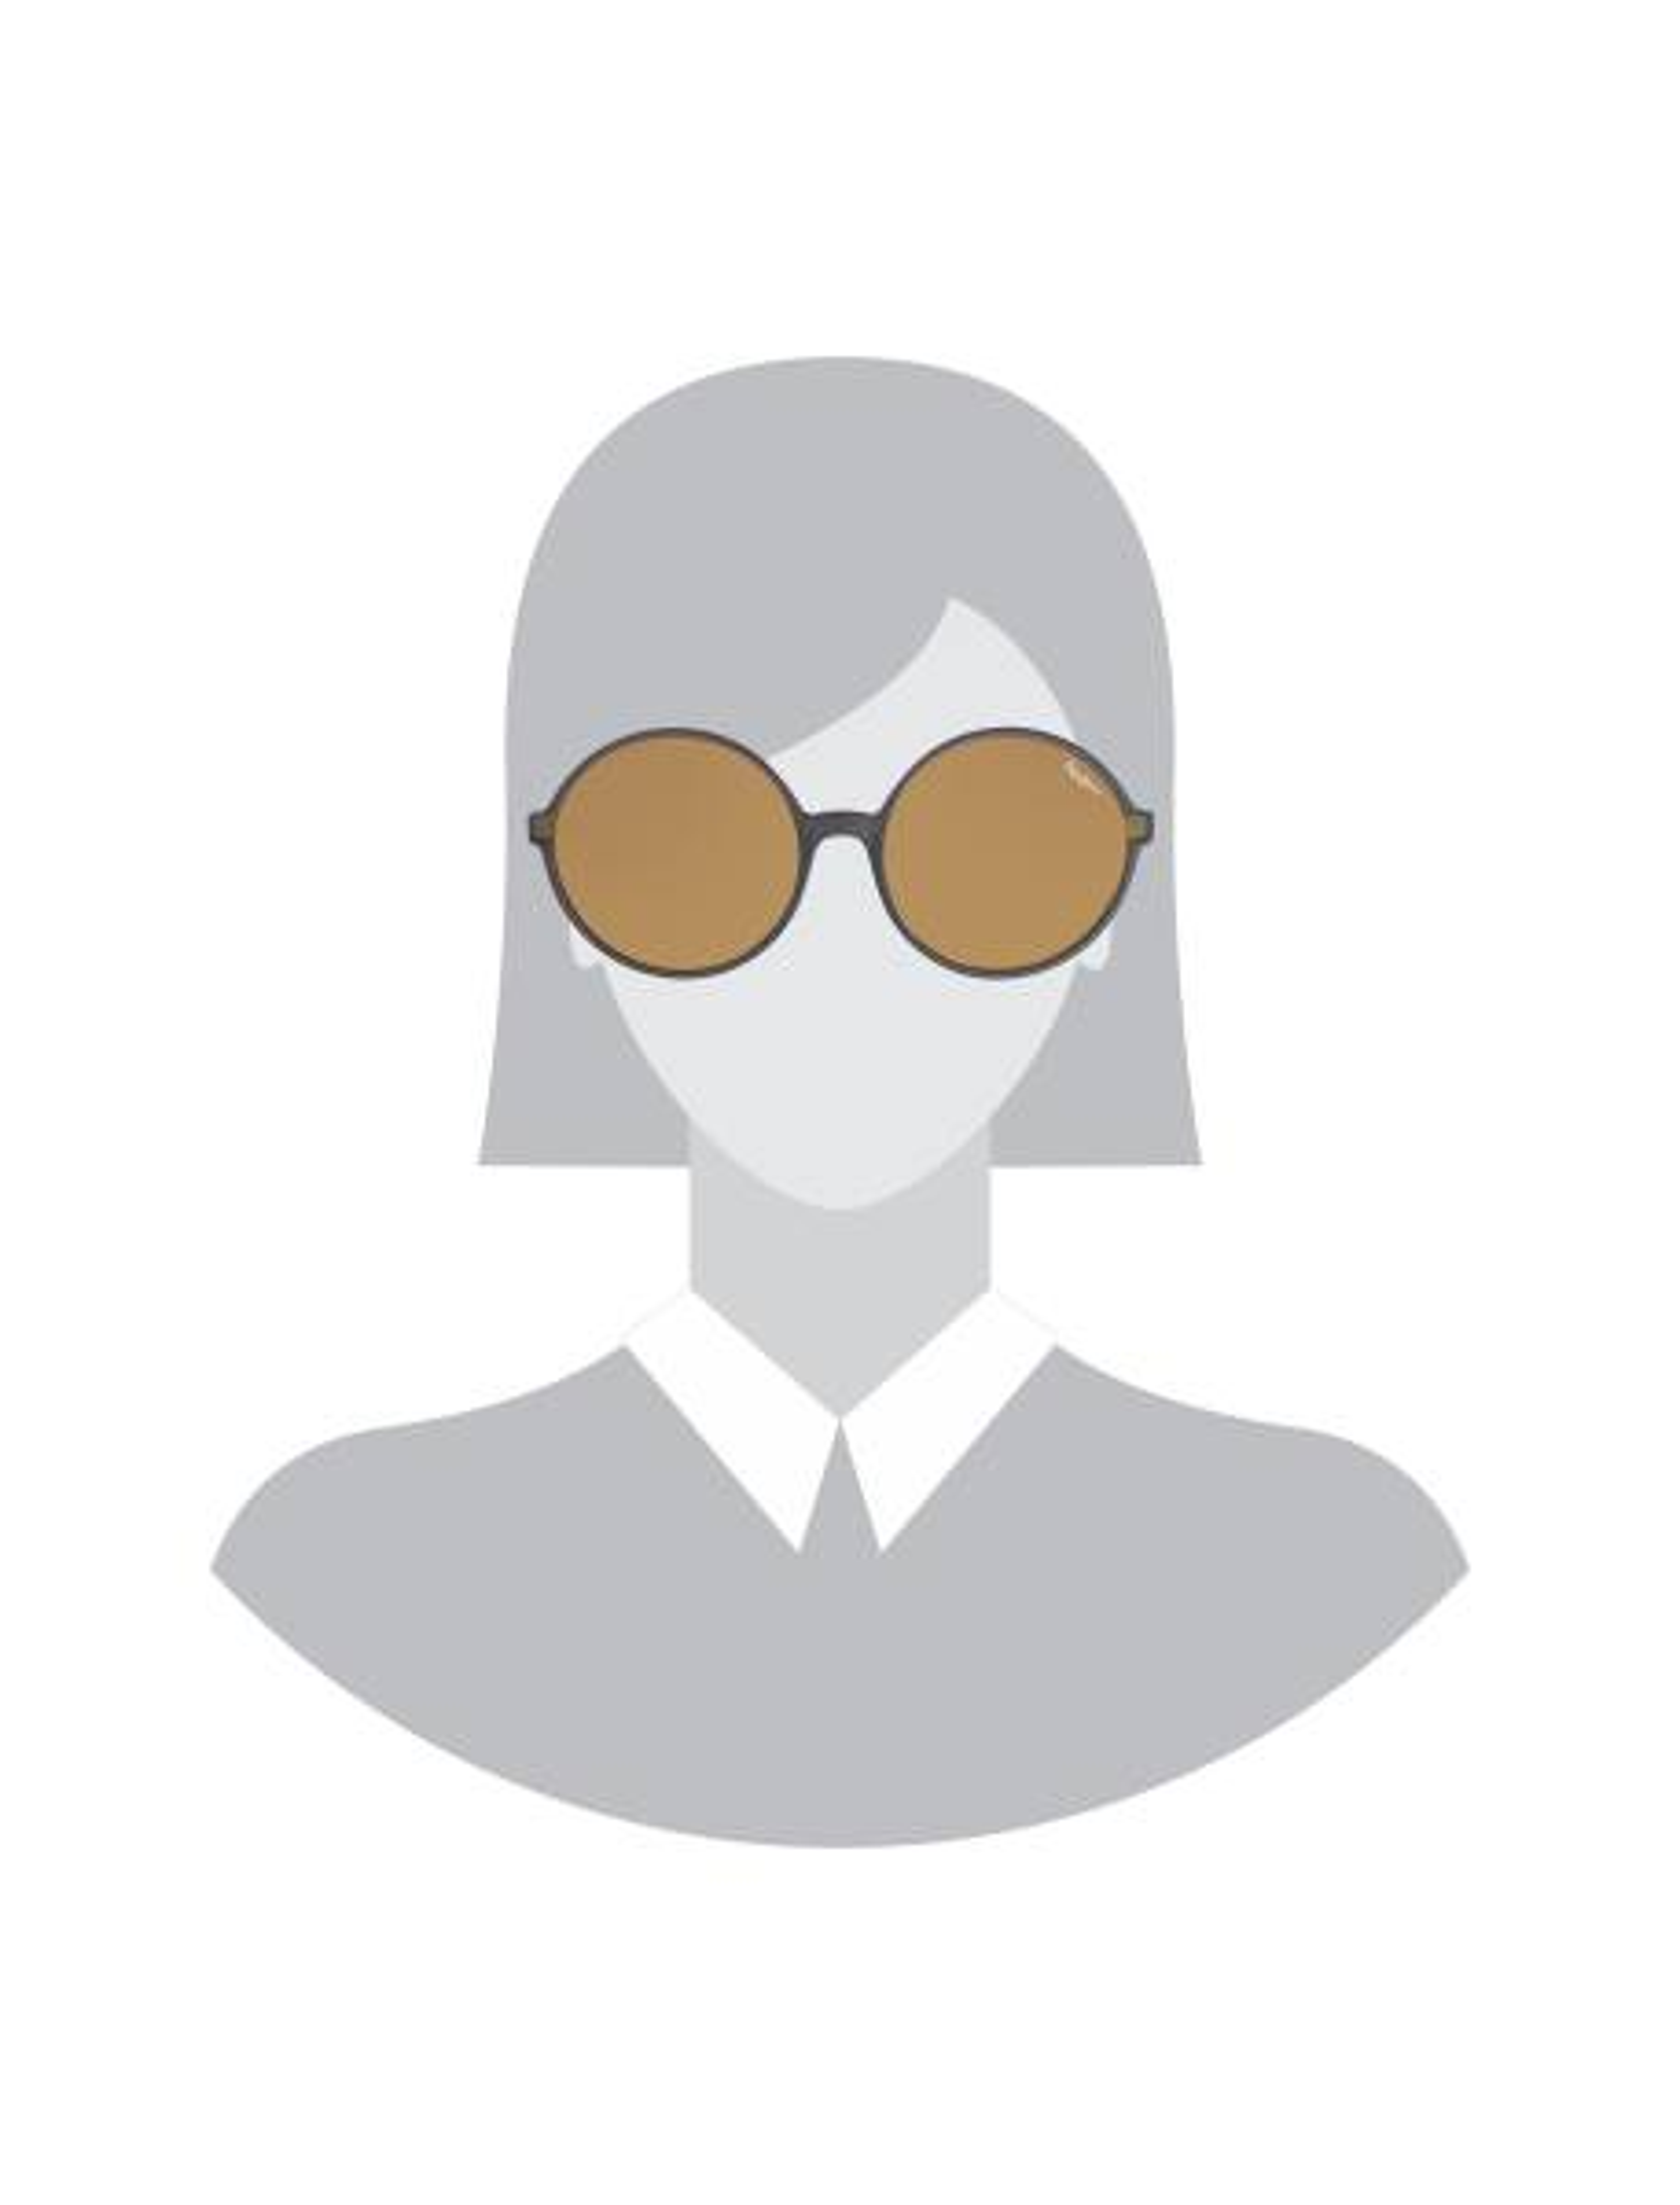 عینک آفتابی گرد زنانه - زغالي - 5